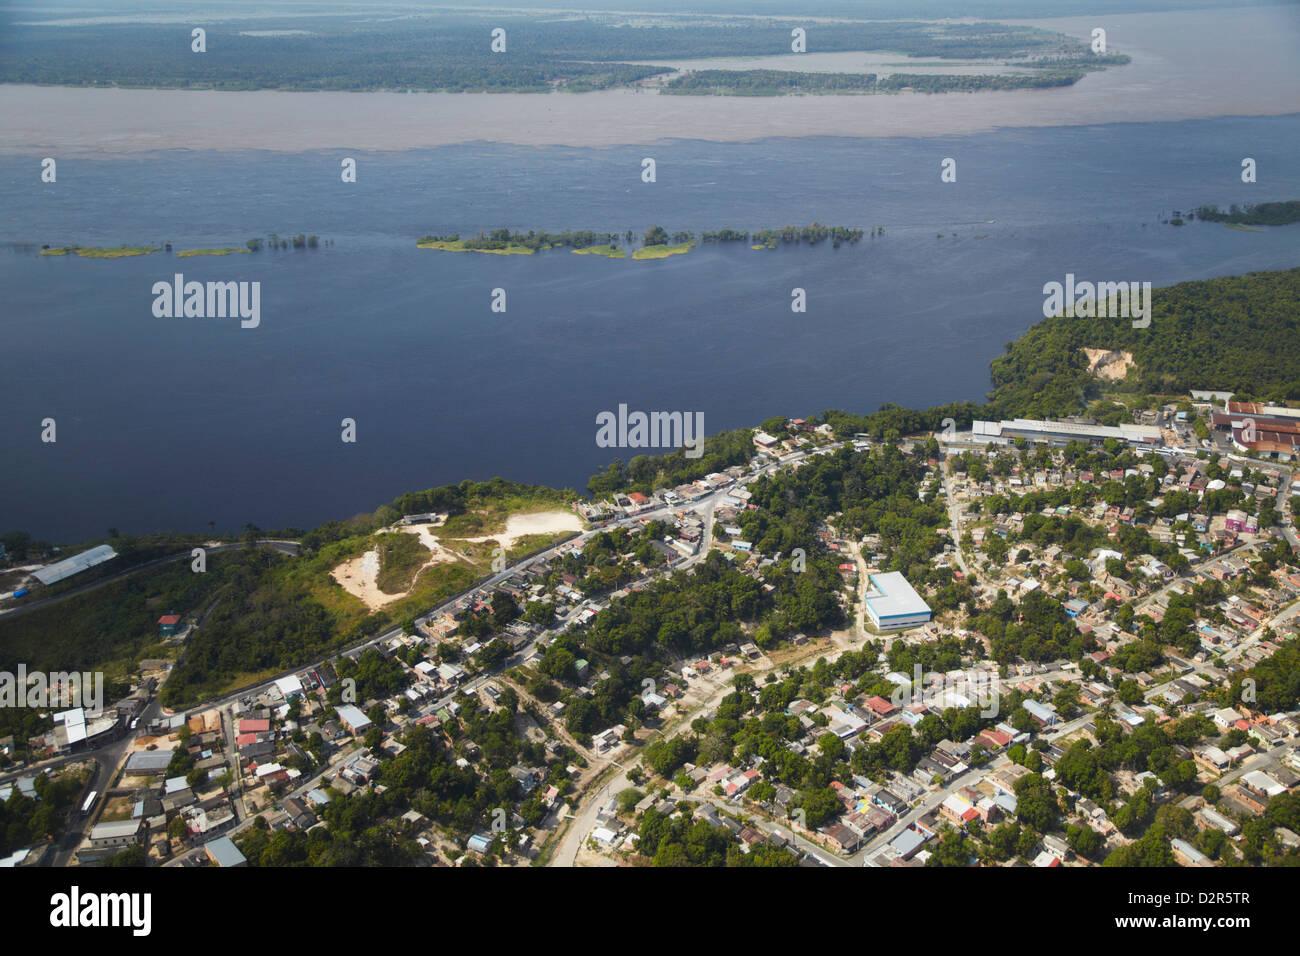 Aerial view of development along the Rio Negro, Manaus, Amazonas, Brazil, South America - Stock Image